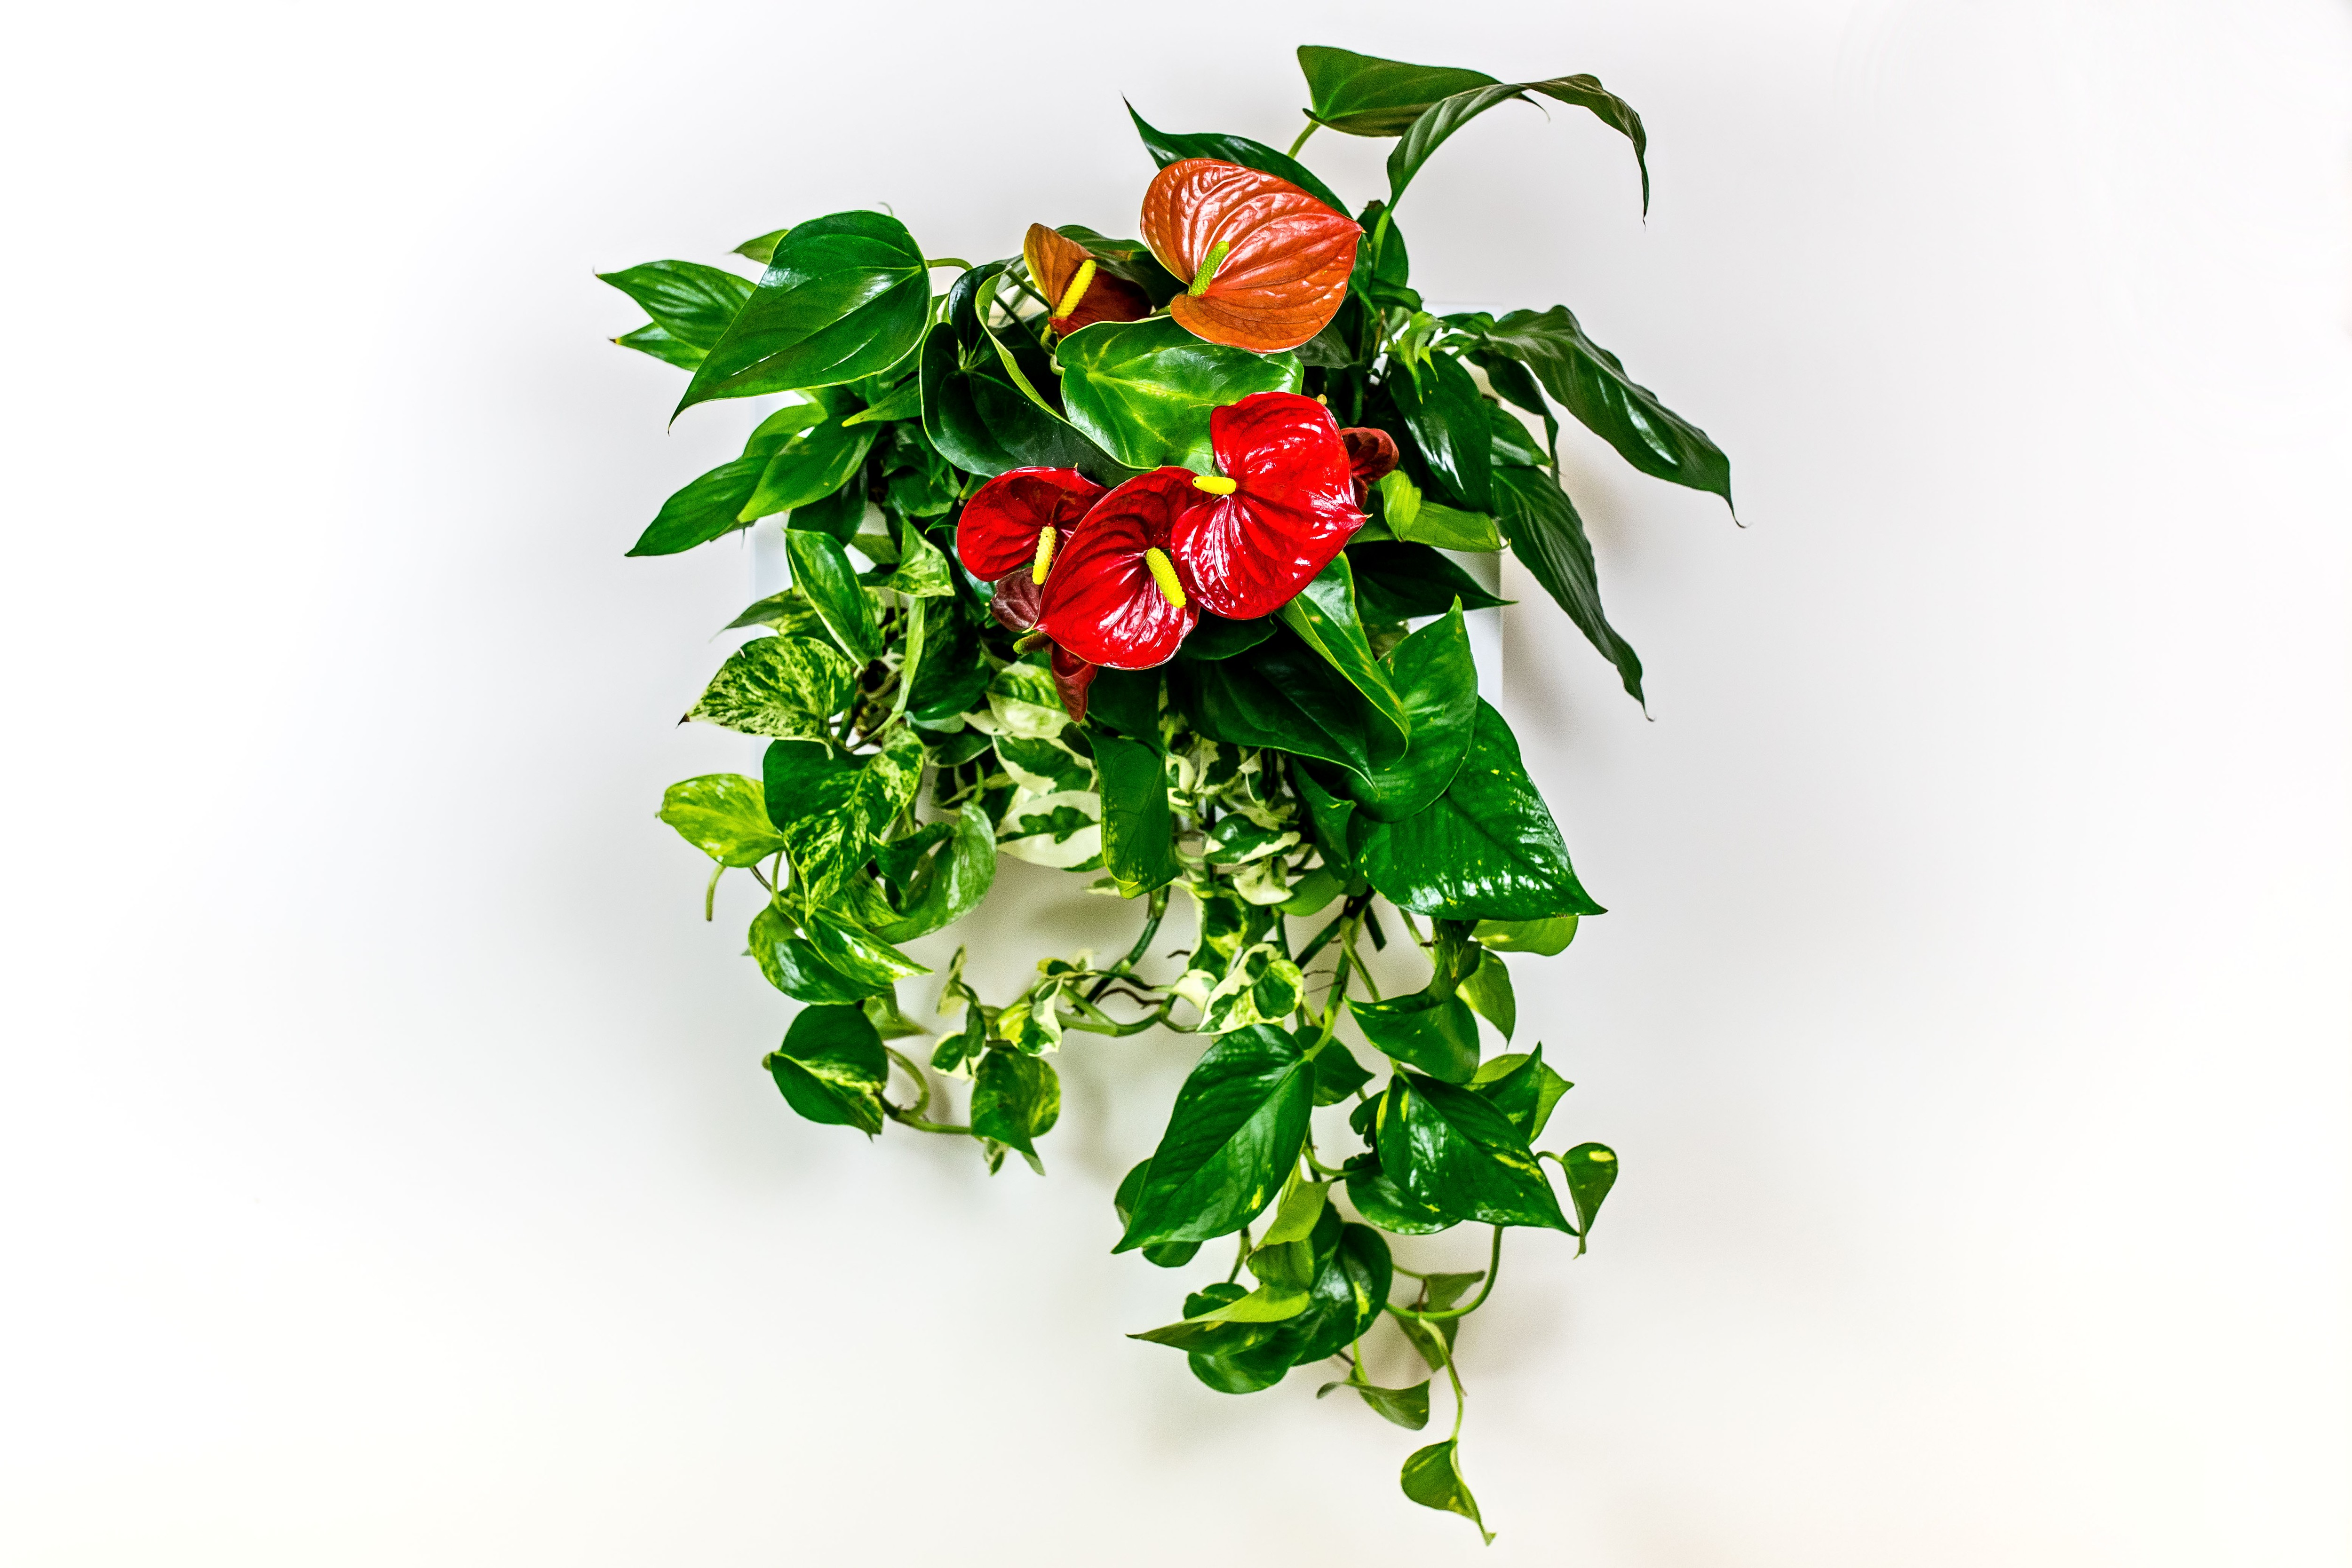 Anthurium, kráska z pralesů